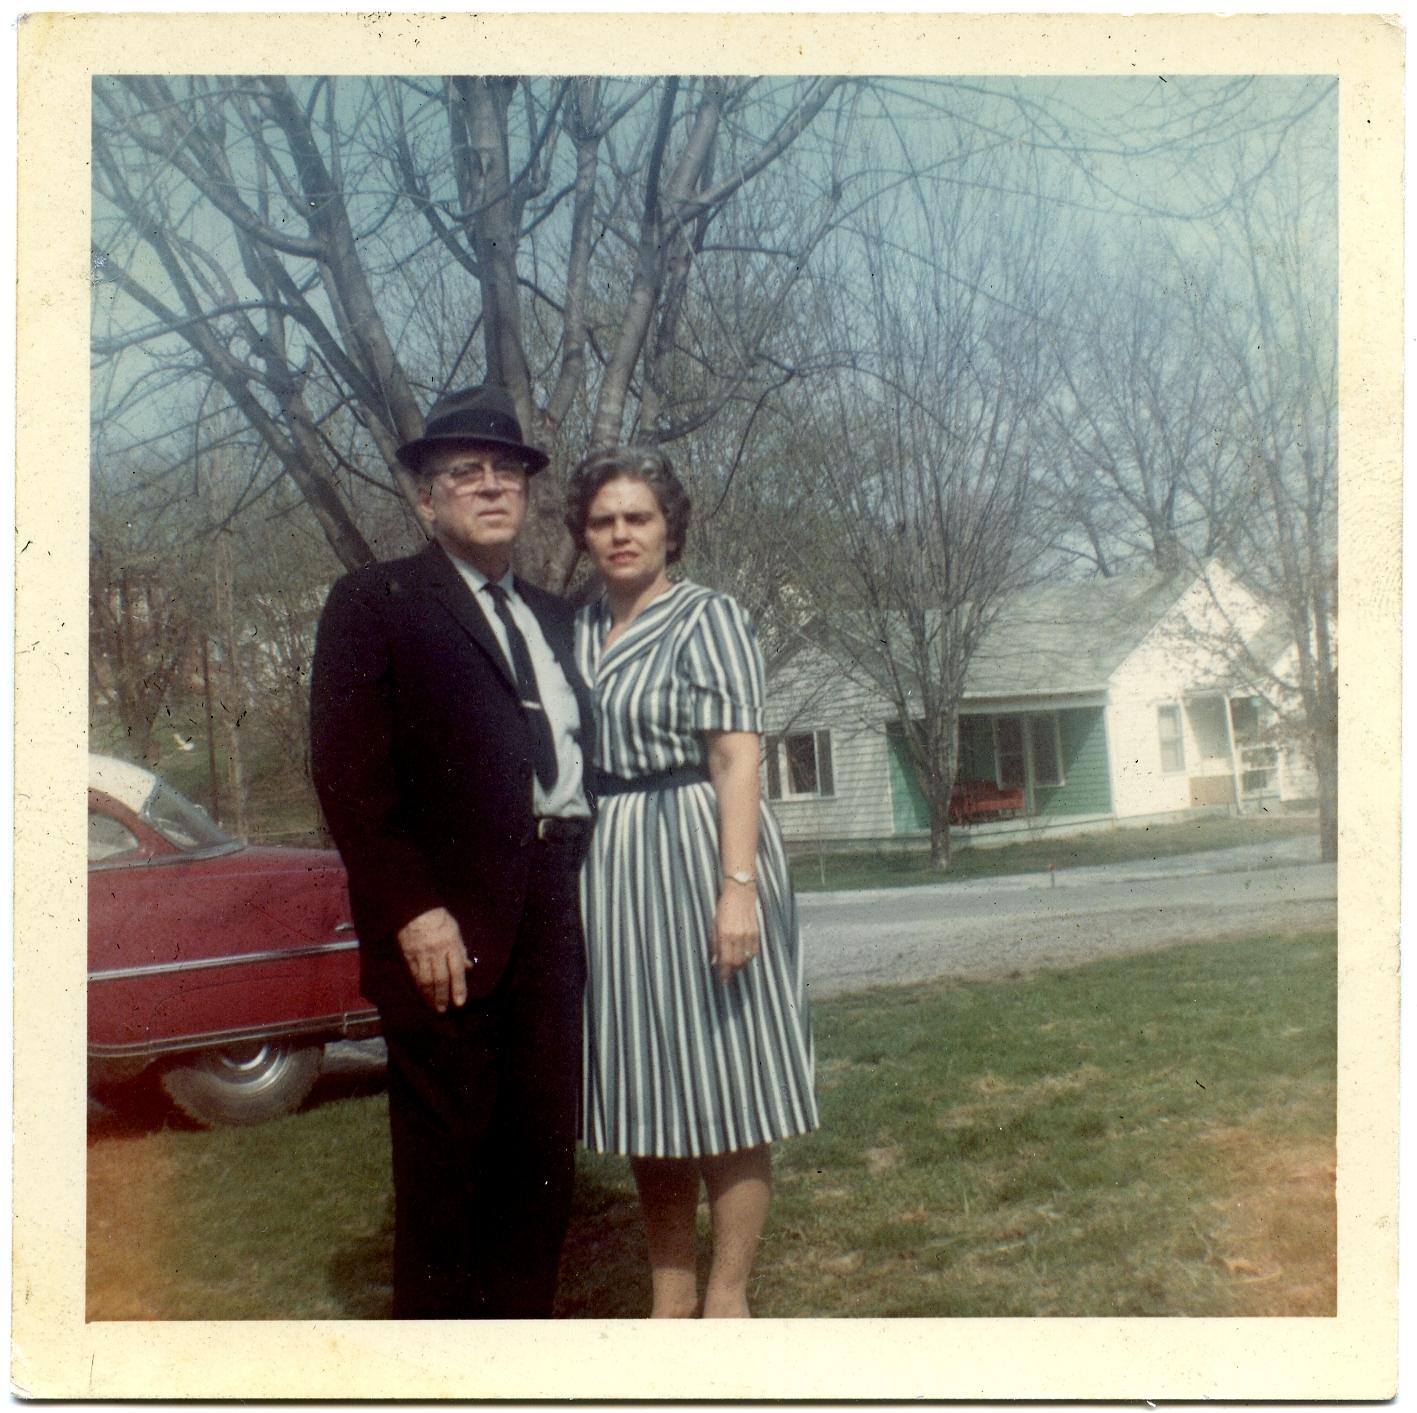 Lillian and John